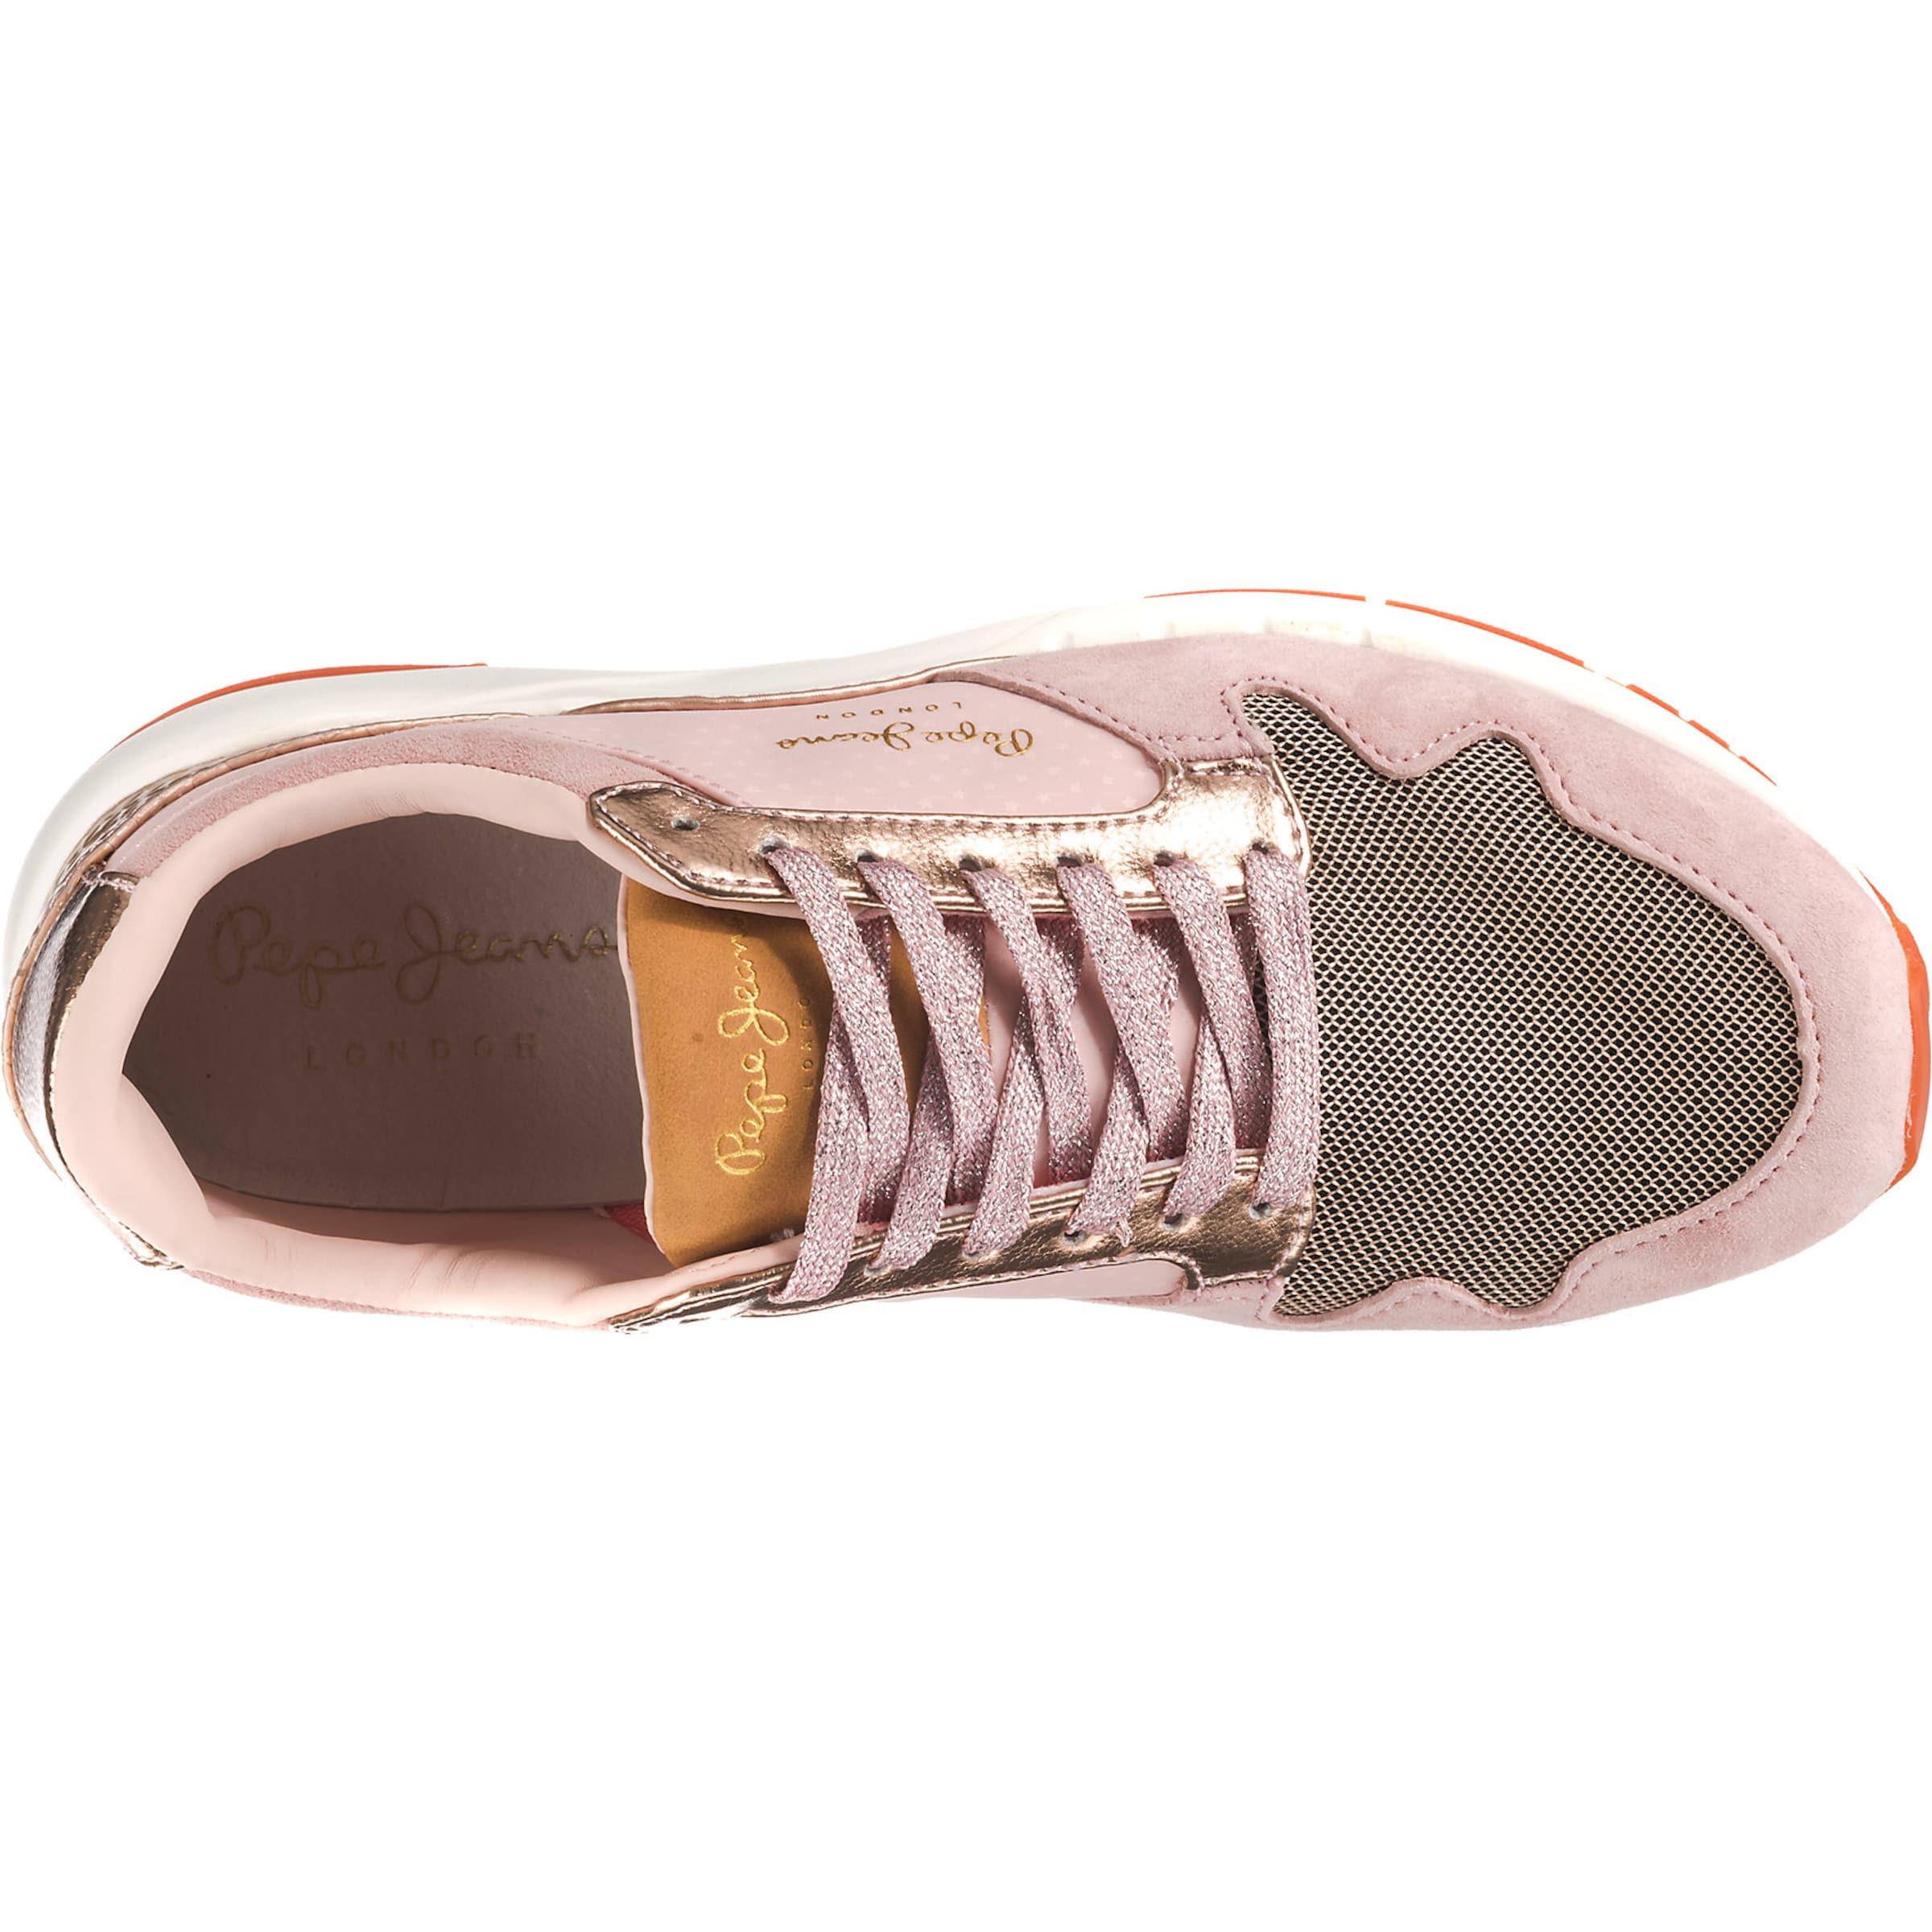 In Altrosa GoldgelbRosegold Sneakers Dunkelorange Pepe Weiß Jeans NPk8wXn0O